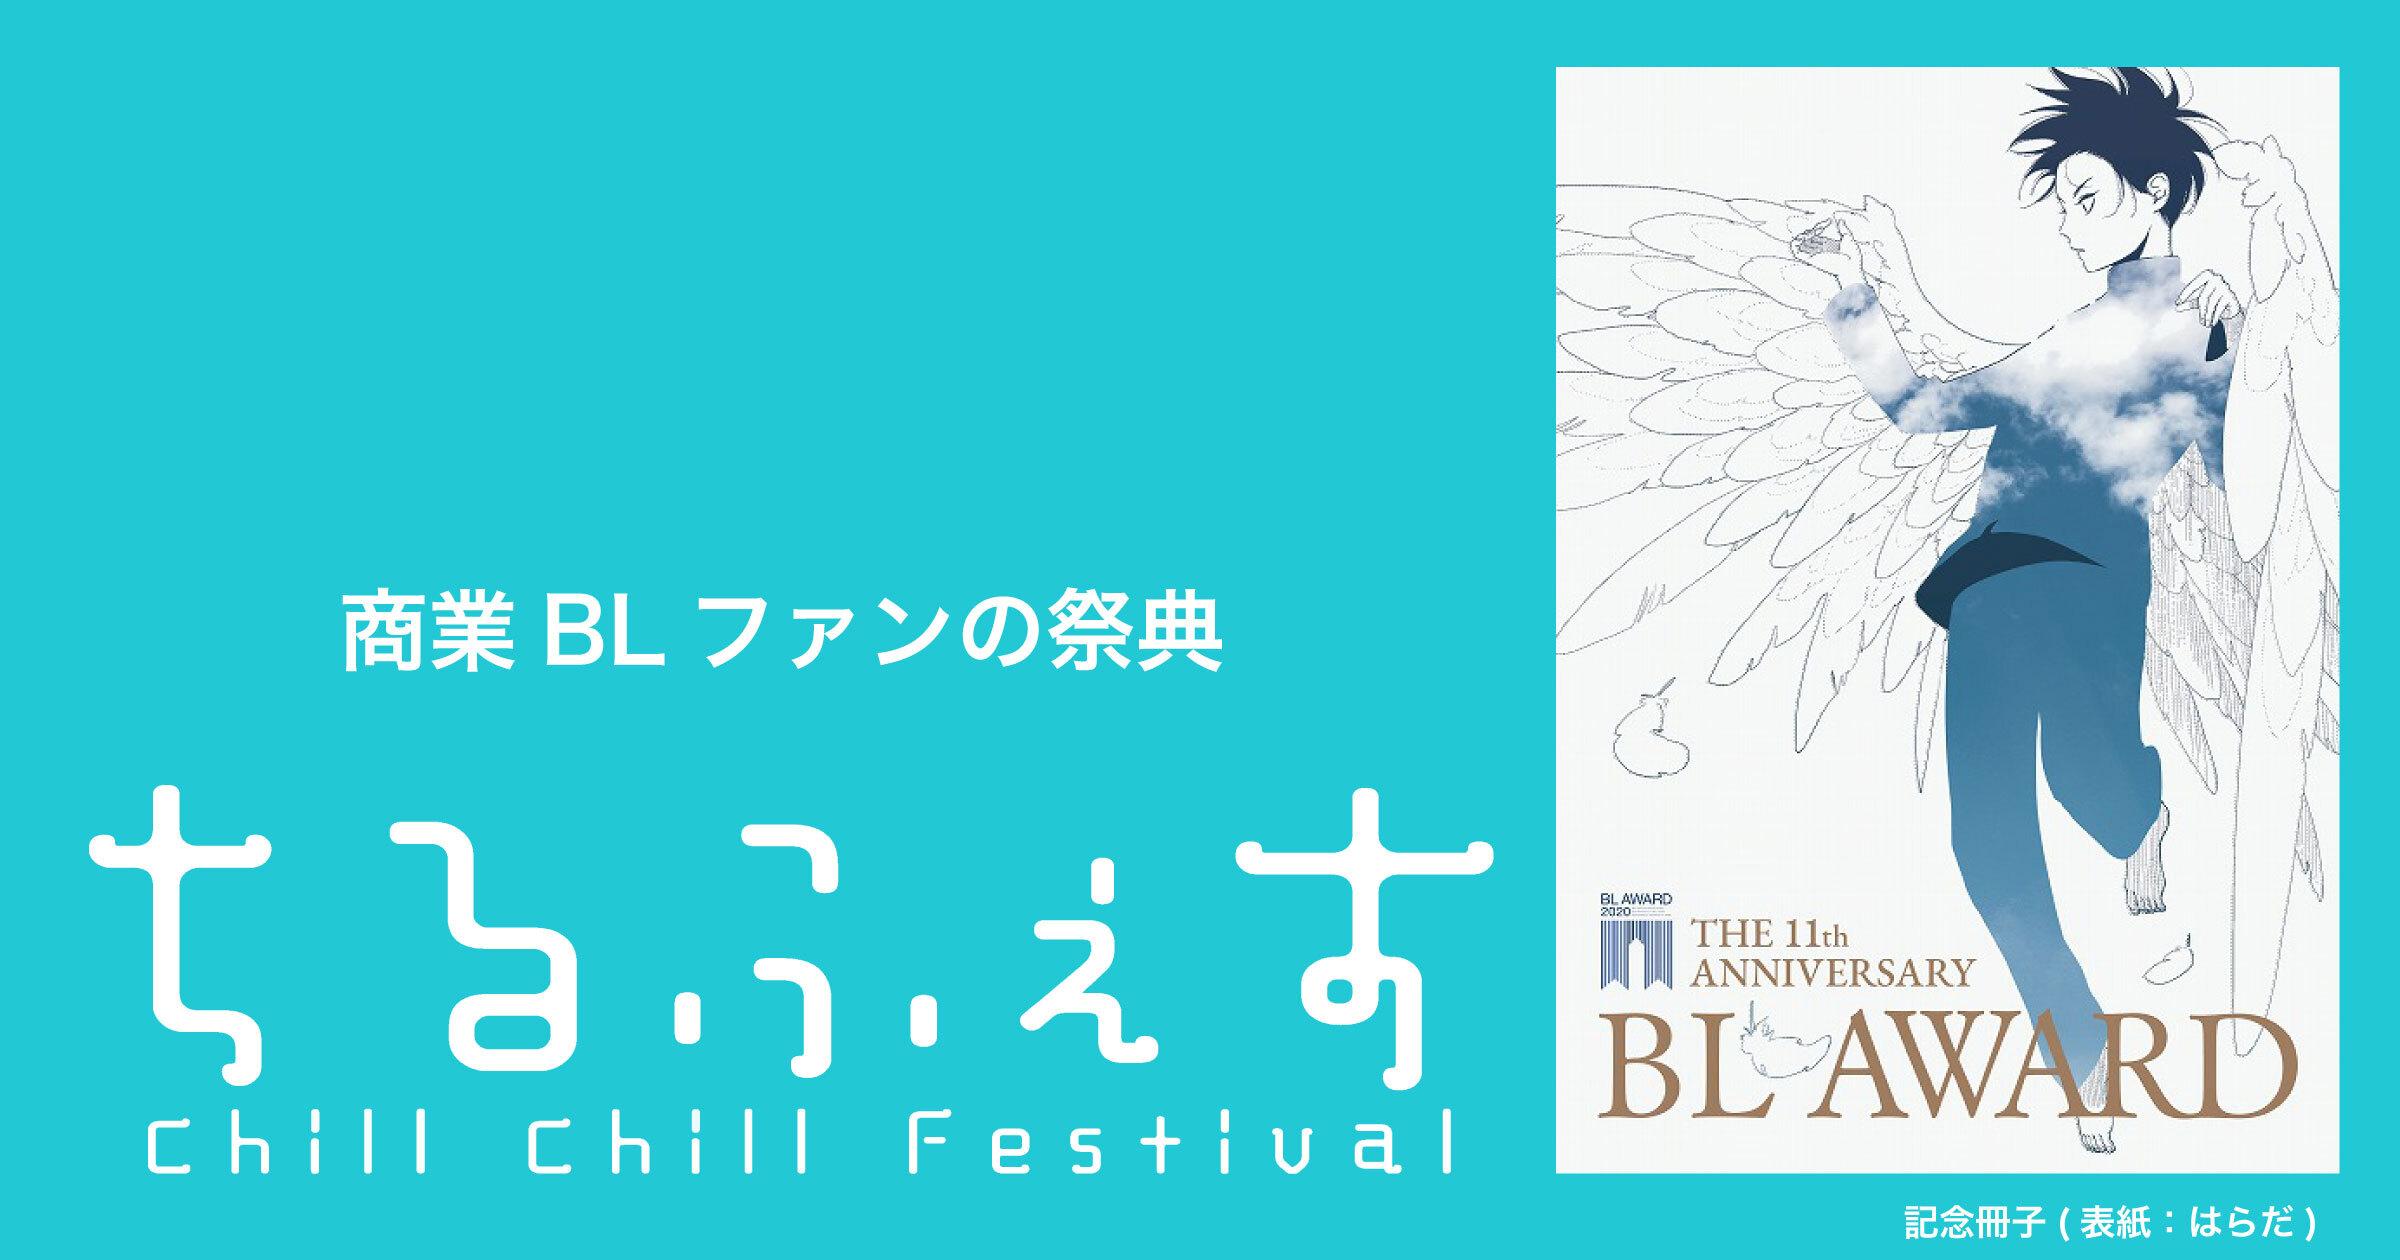 【CHILL CHILL FESTIVAL 3rd】7月18日複製原画展入場整理券